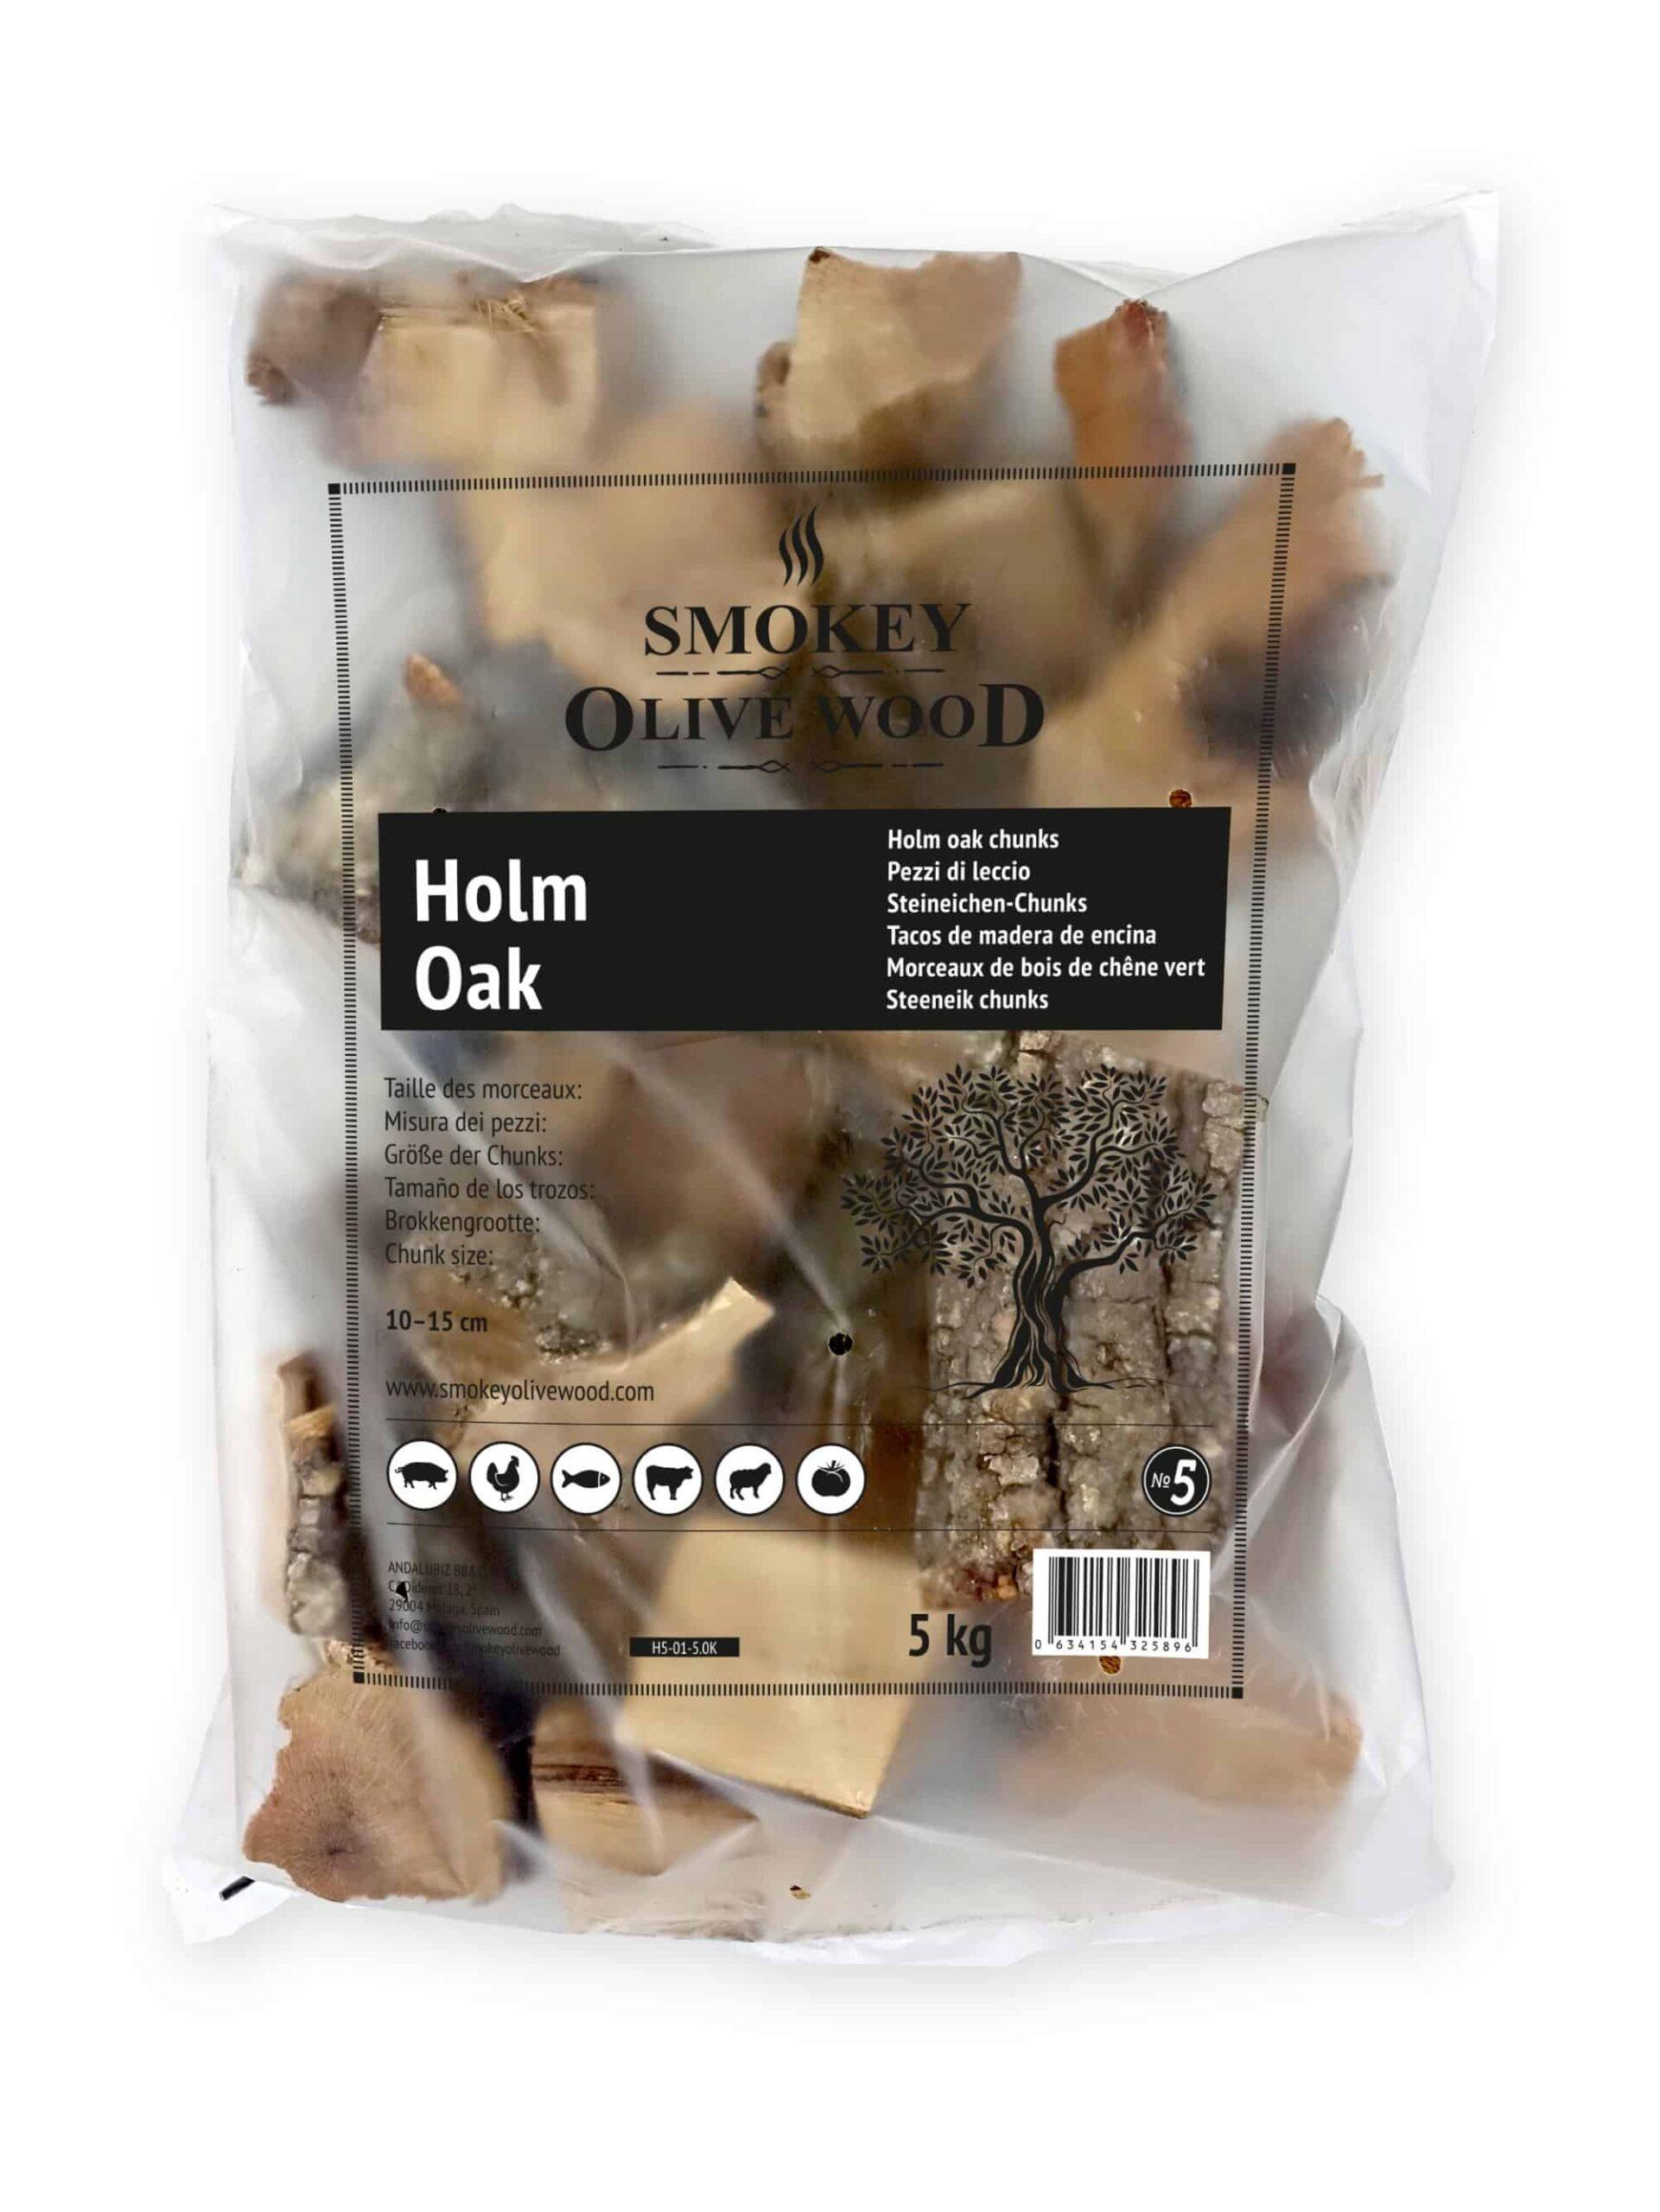 SOW holm oak wood chunks